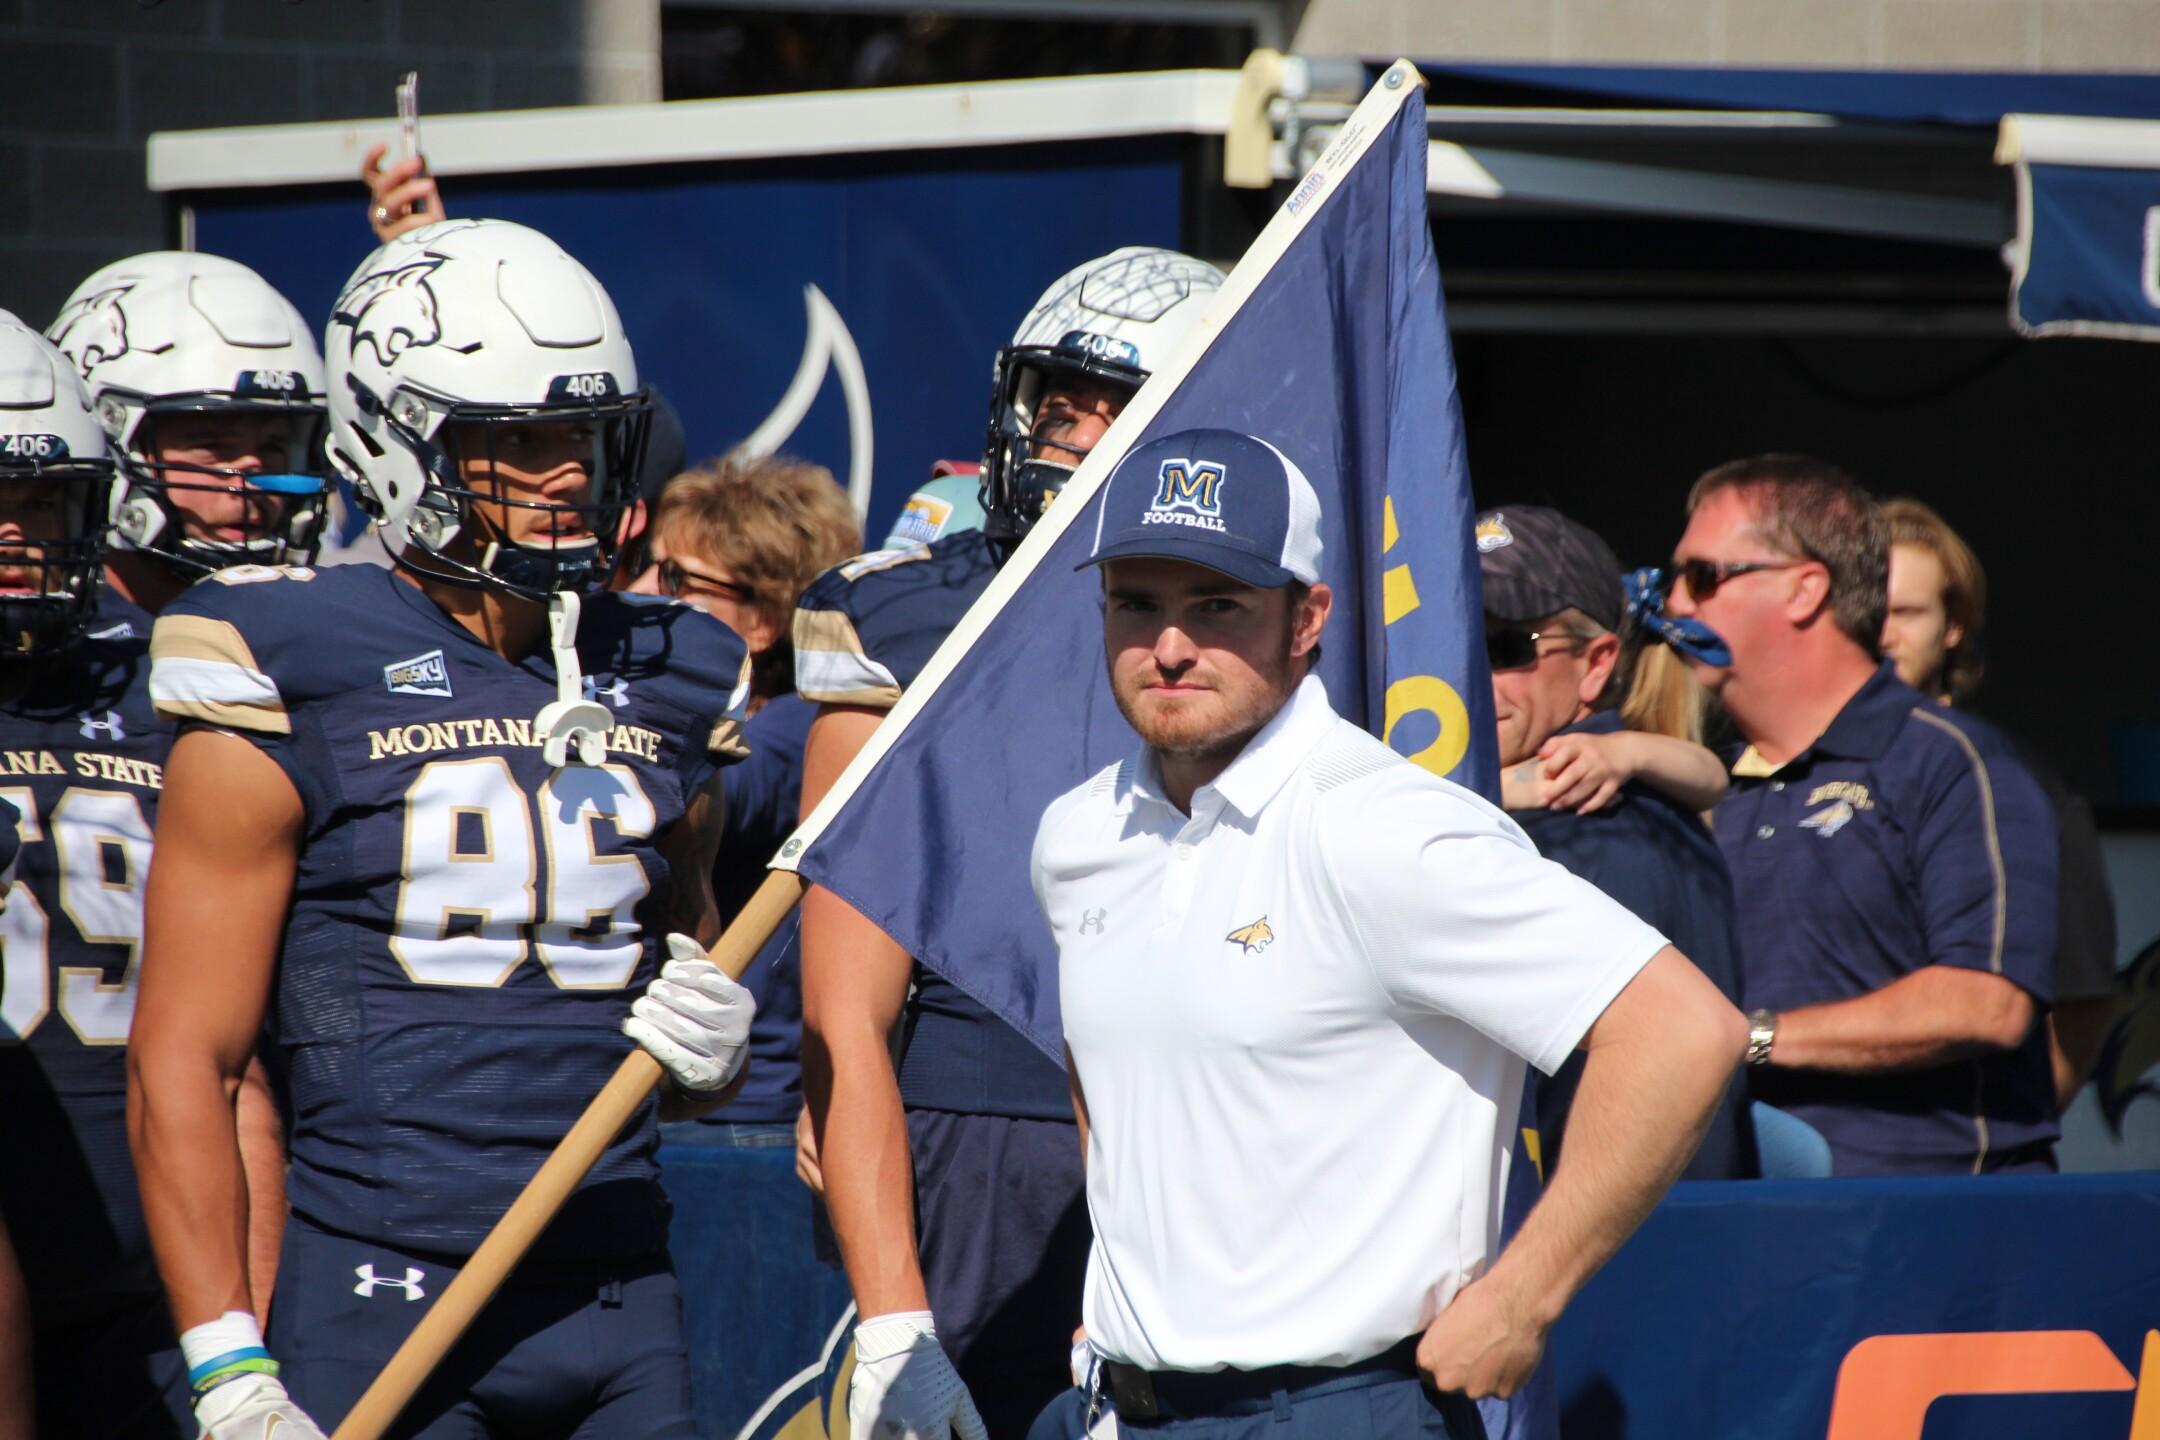 Lance McCutcheon carries the state flag